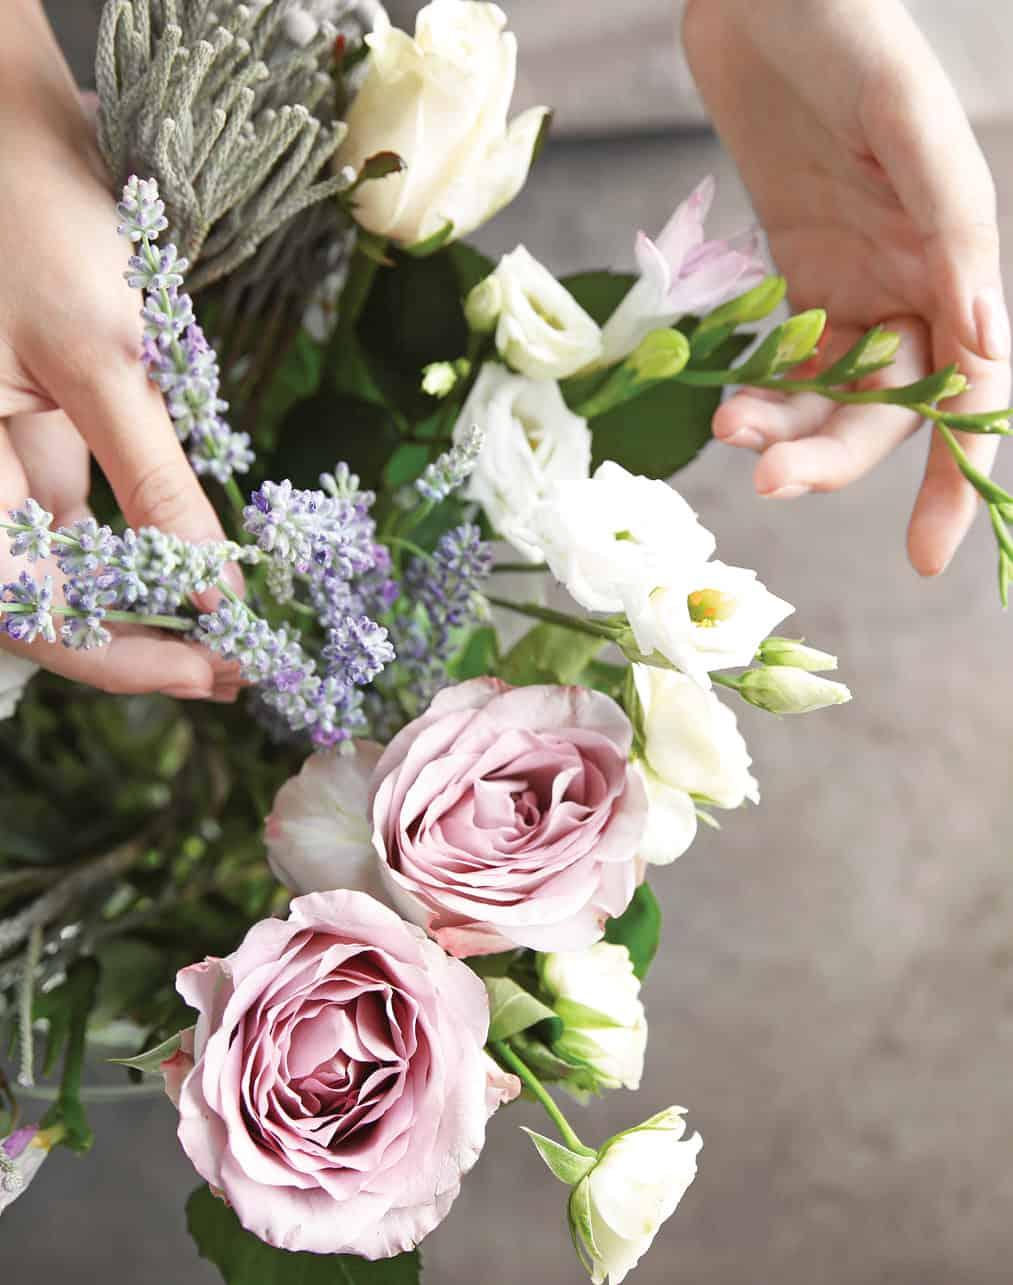 Accommodation - Flowers